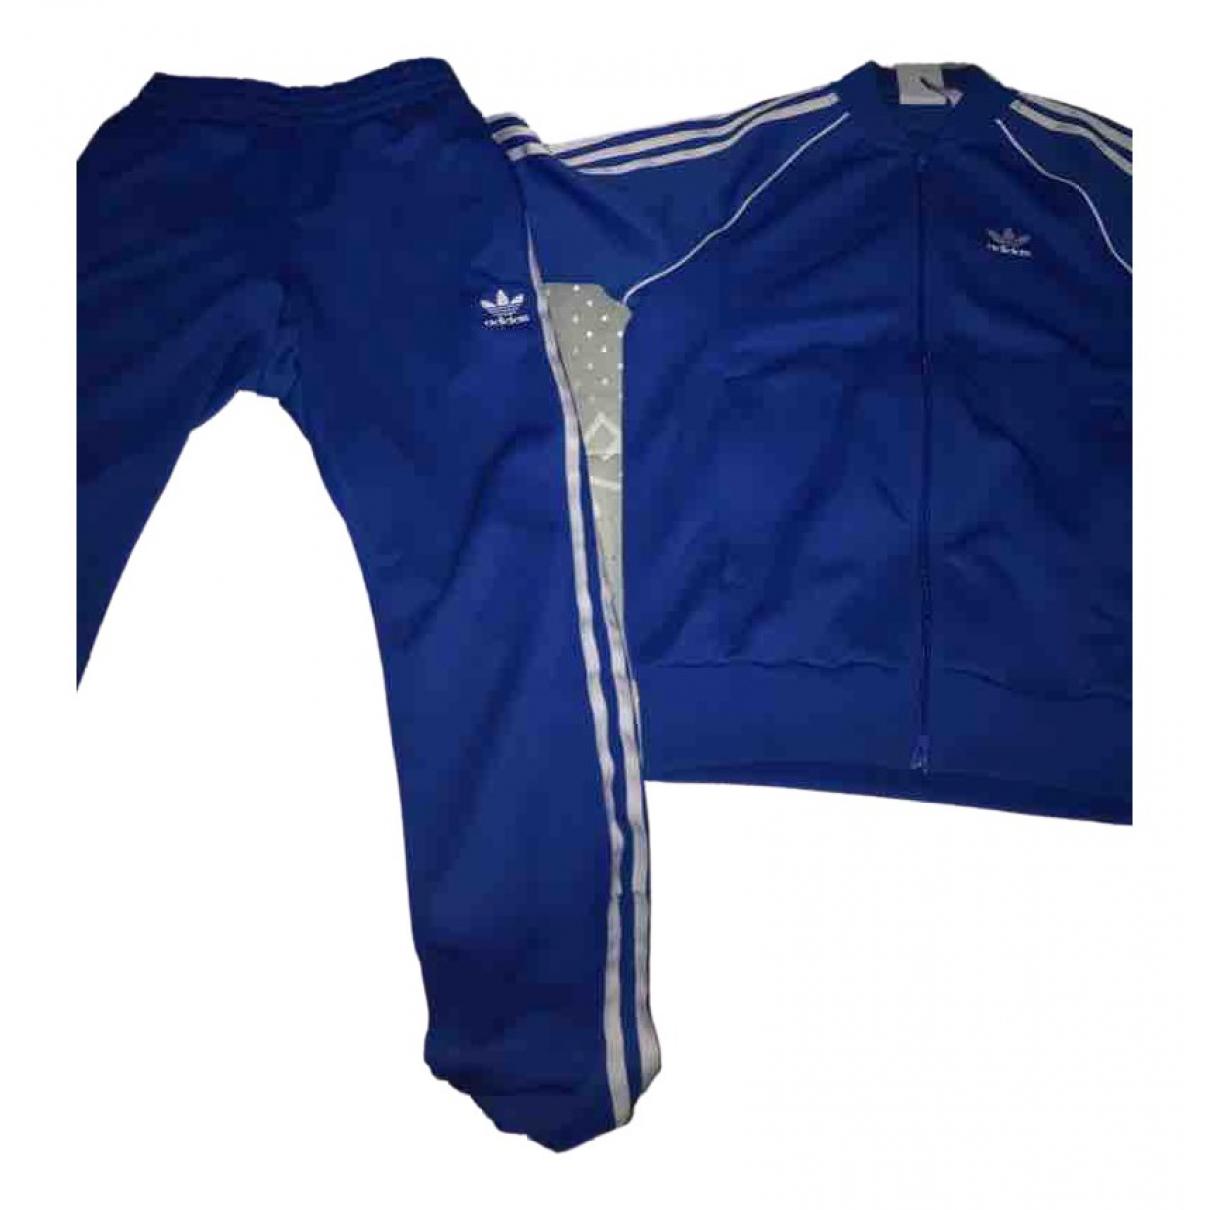 Adidas \N Blue Trousers for Men XS International